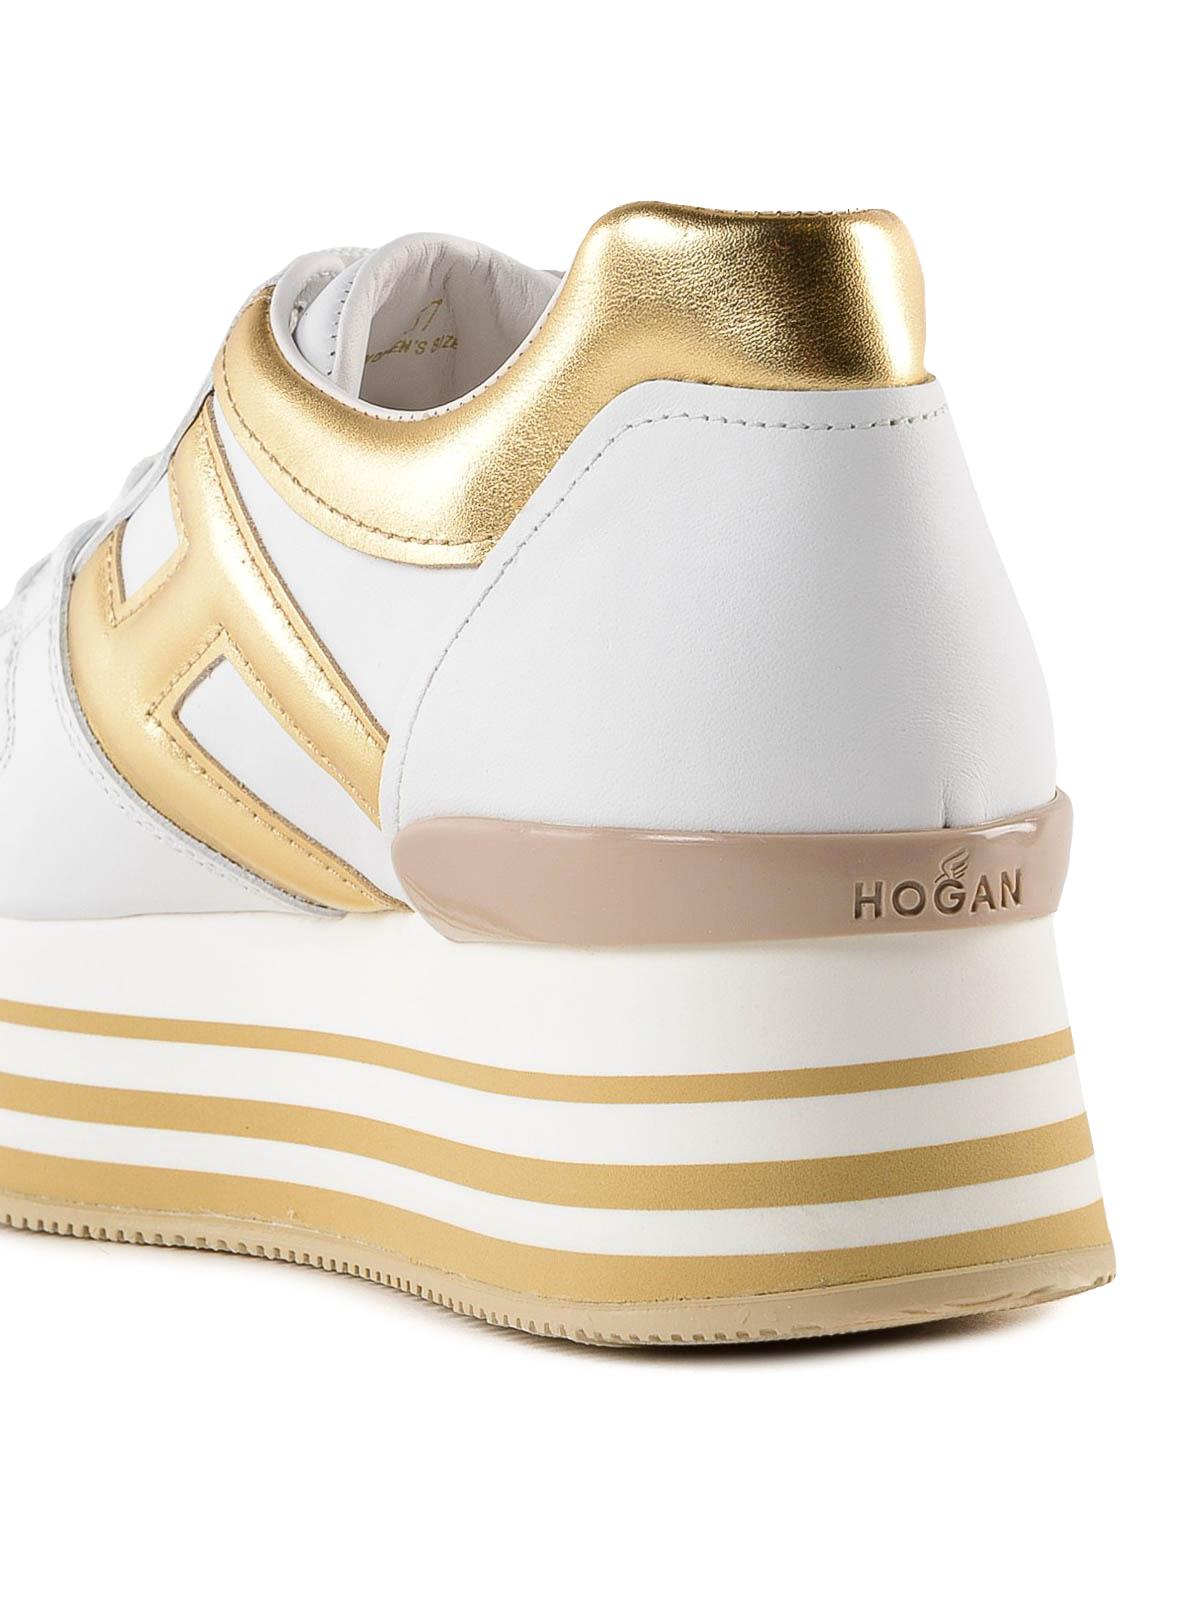 Sneakers Hogan - Sneaker Maxi H222 bianca e oro in pelle ...